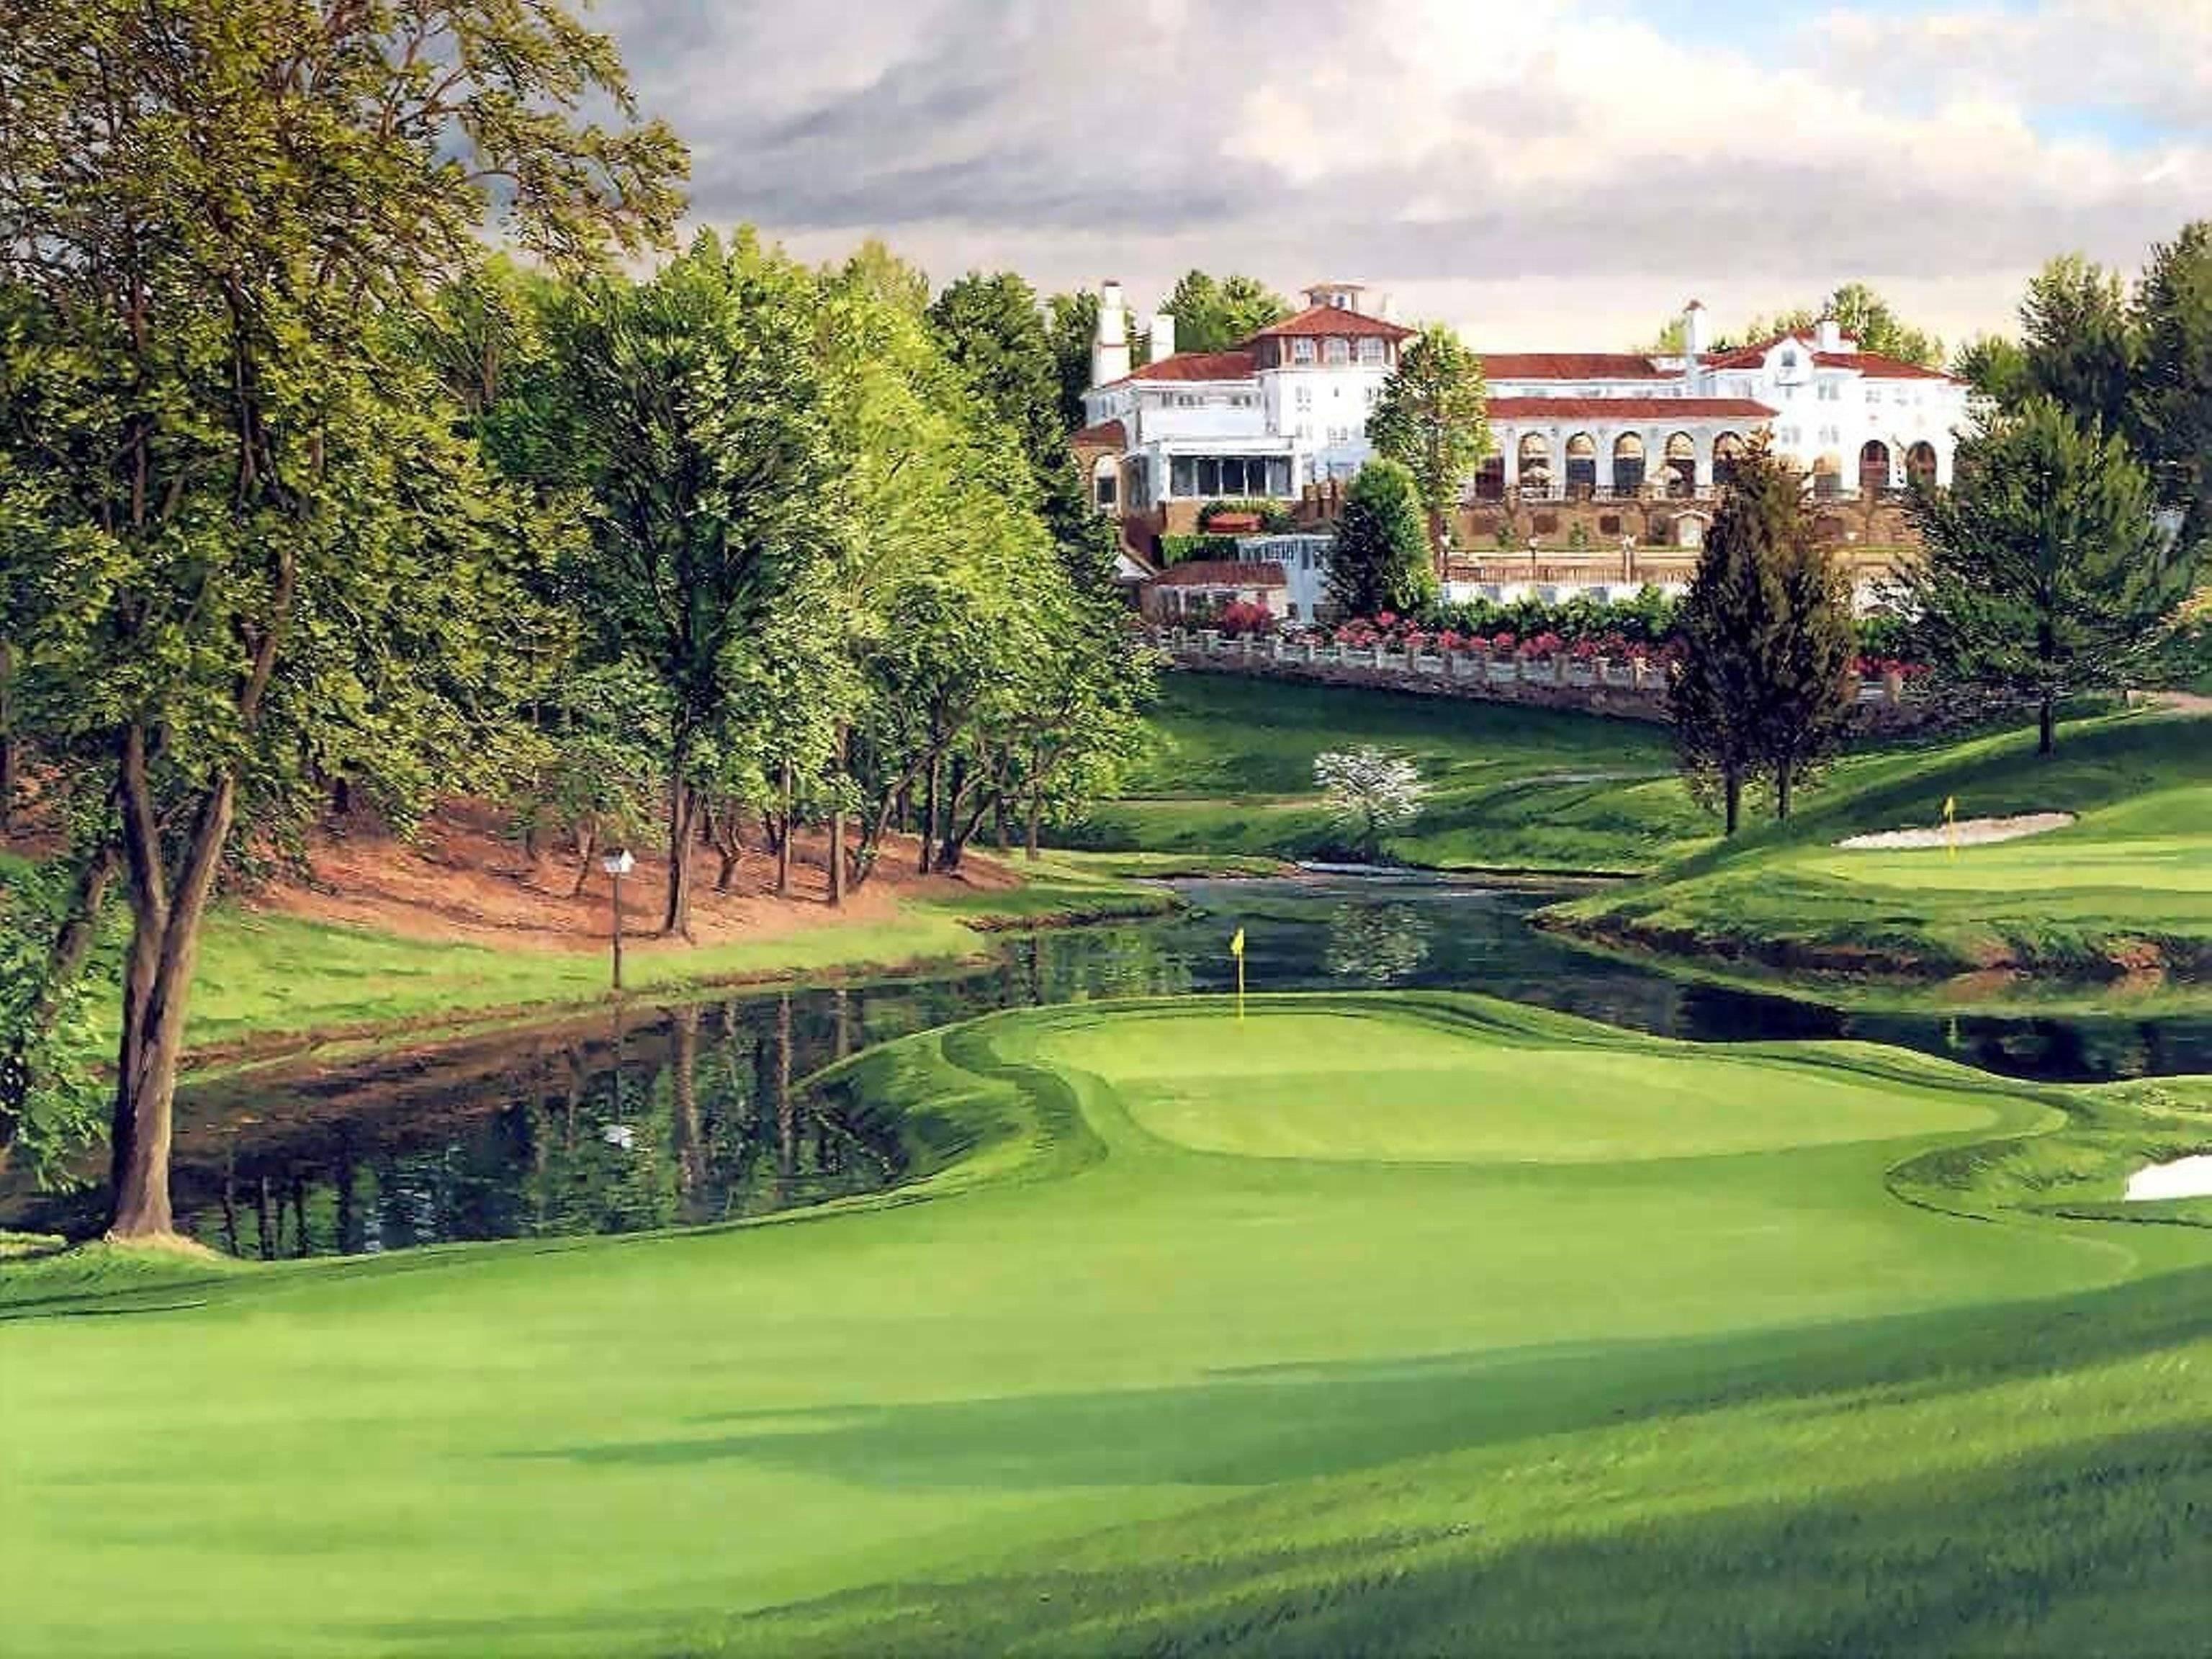 golf course wallpapers wallpaper